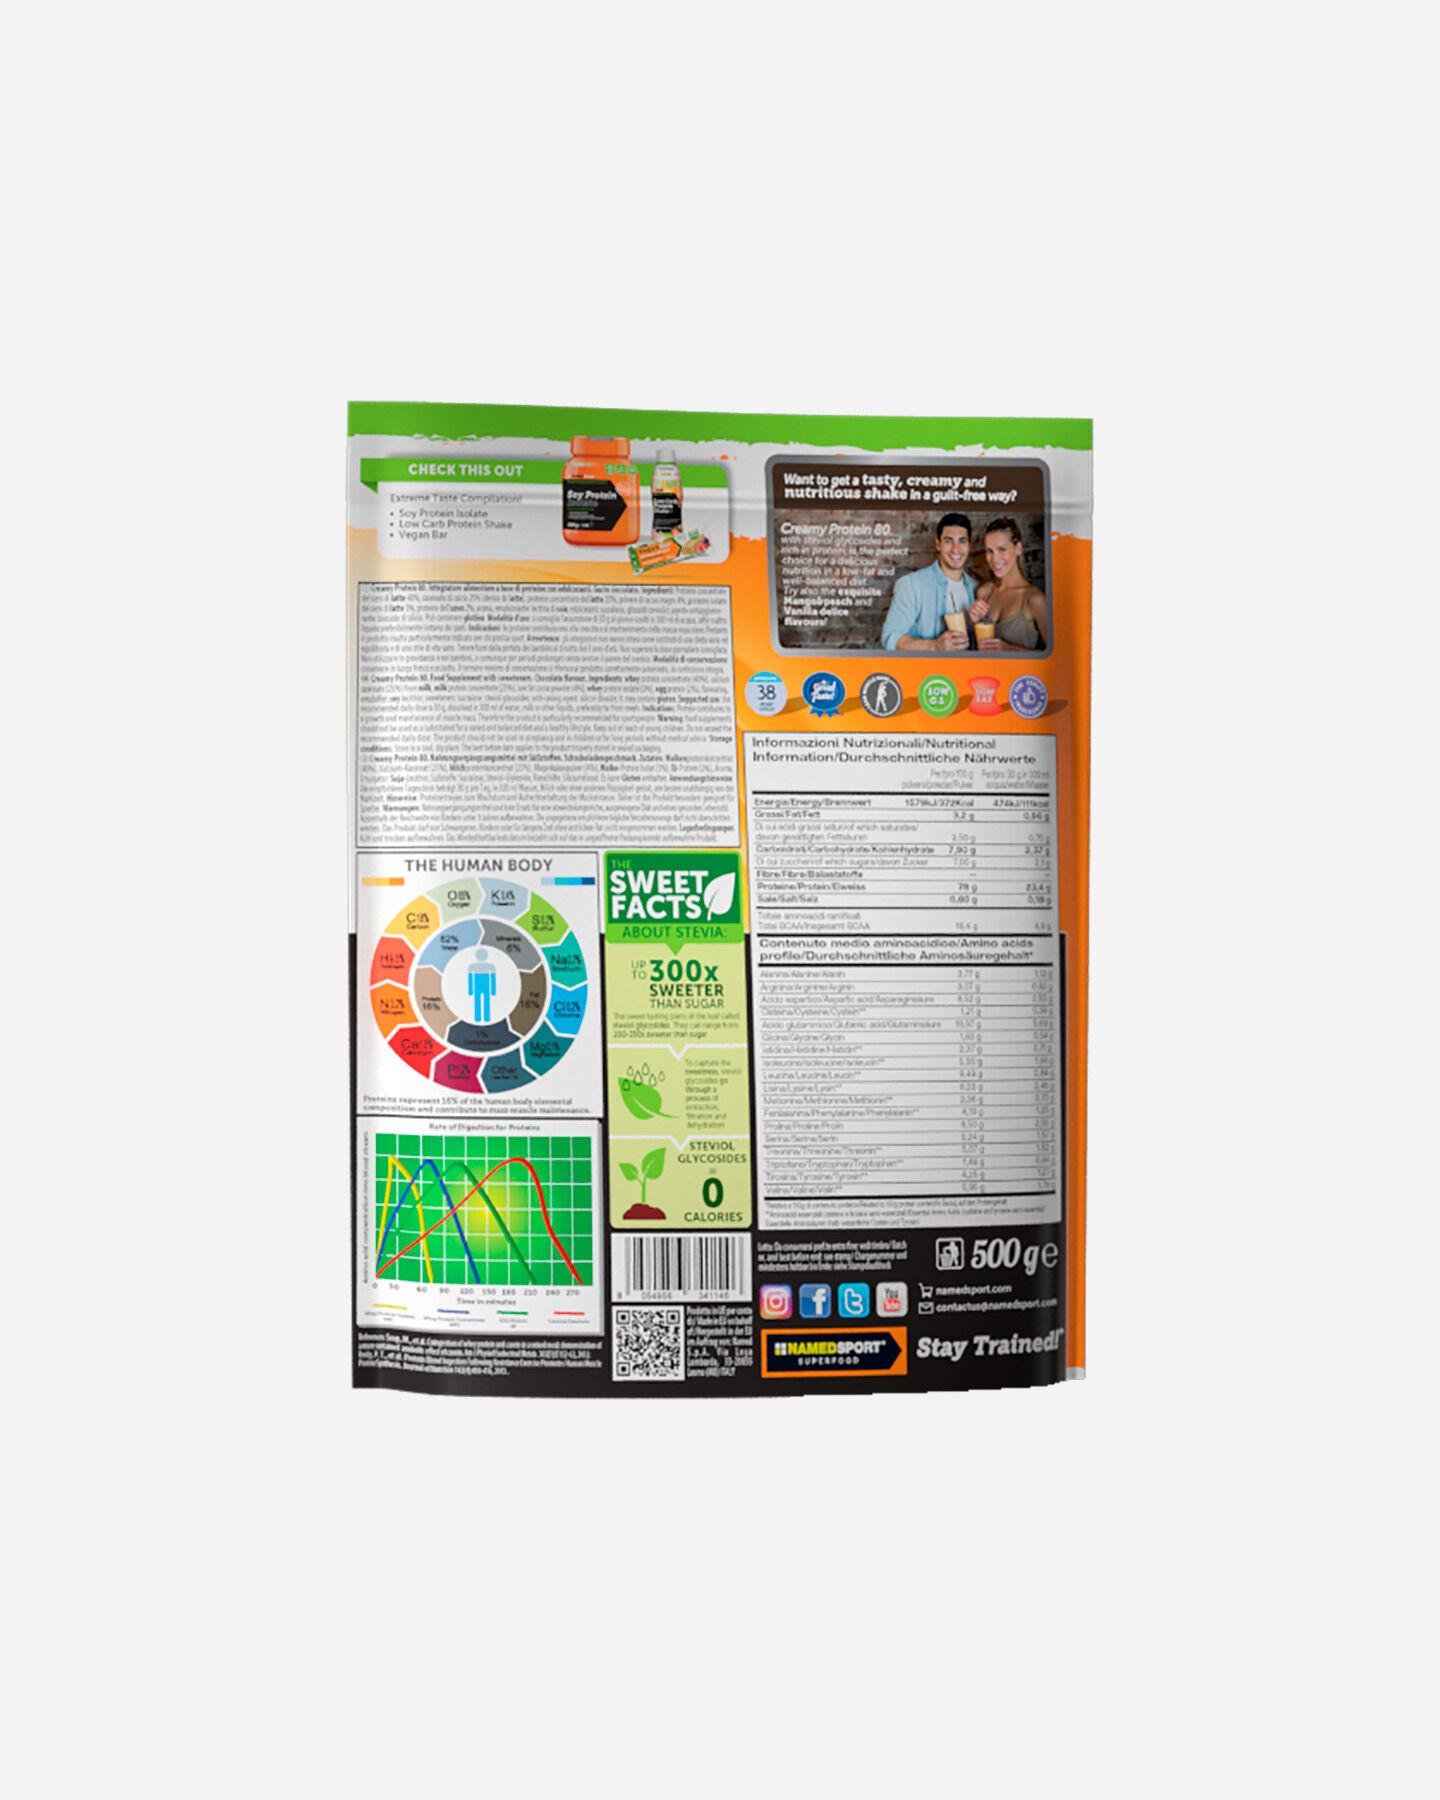 Energetico NAMED SPORT CREAMY PROTEIN 500G S4024061 1 UNI scatto 1